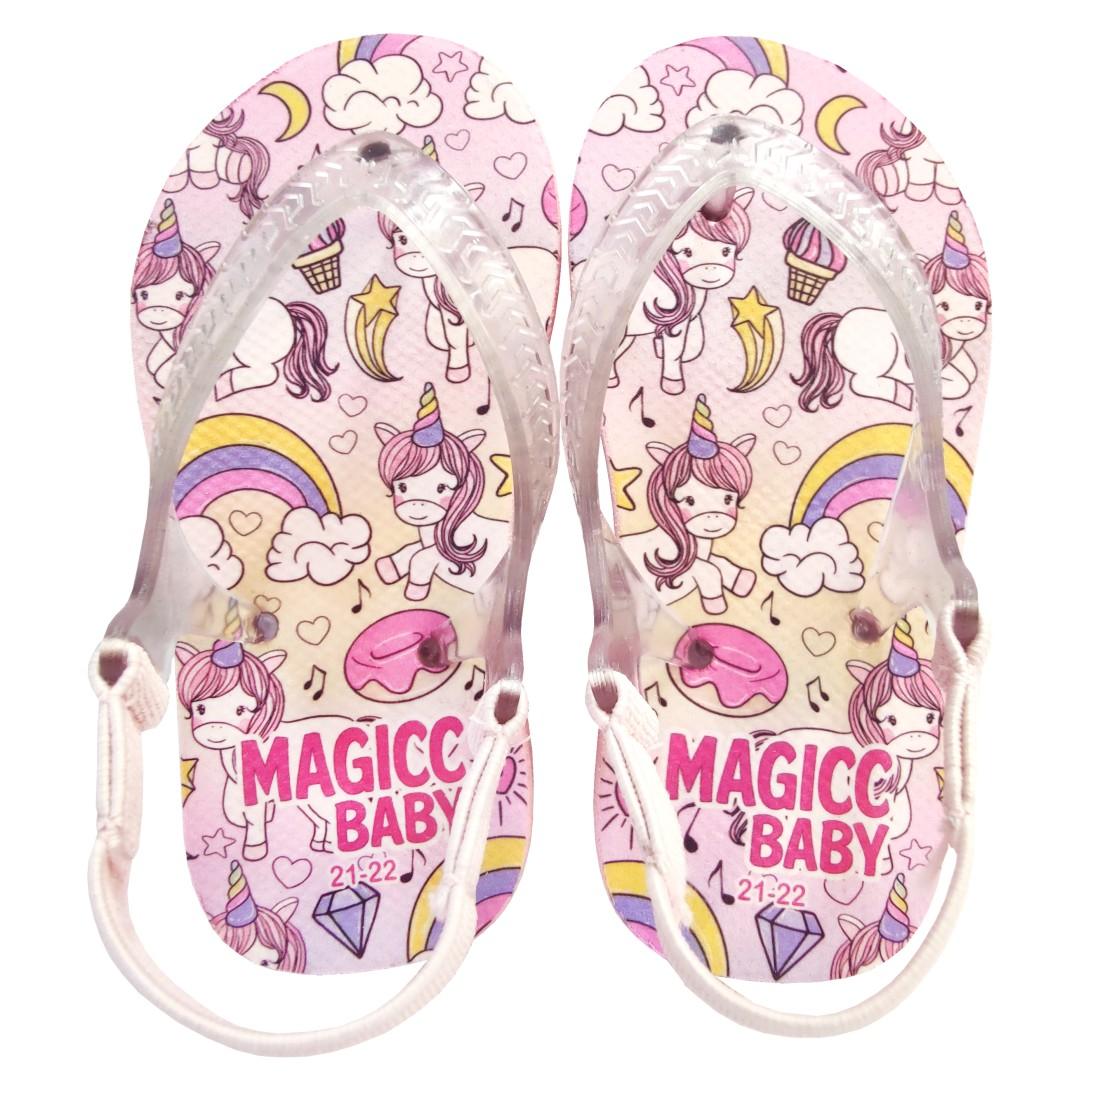 Chinelo Menina Bebê Sandália Unicórnio Arco-Íris Magicc Baby